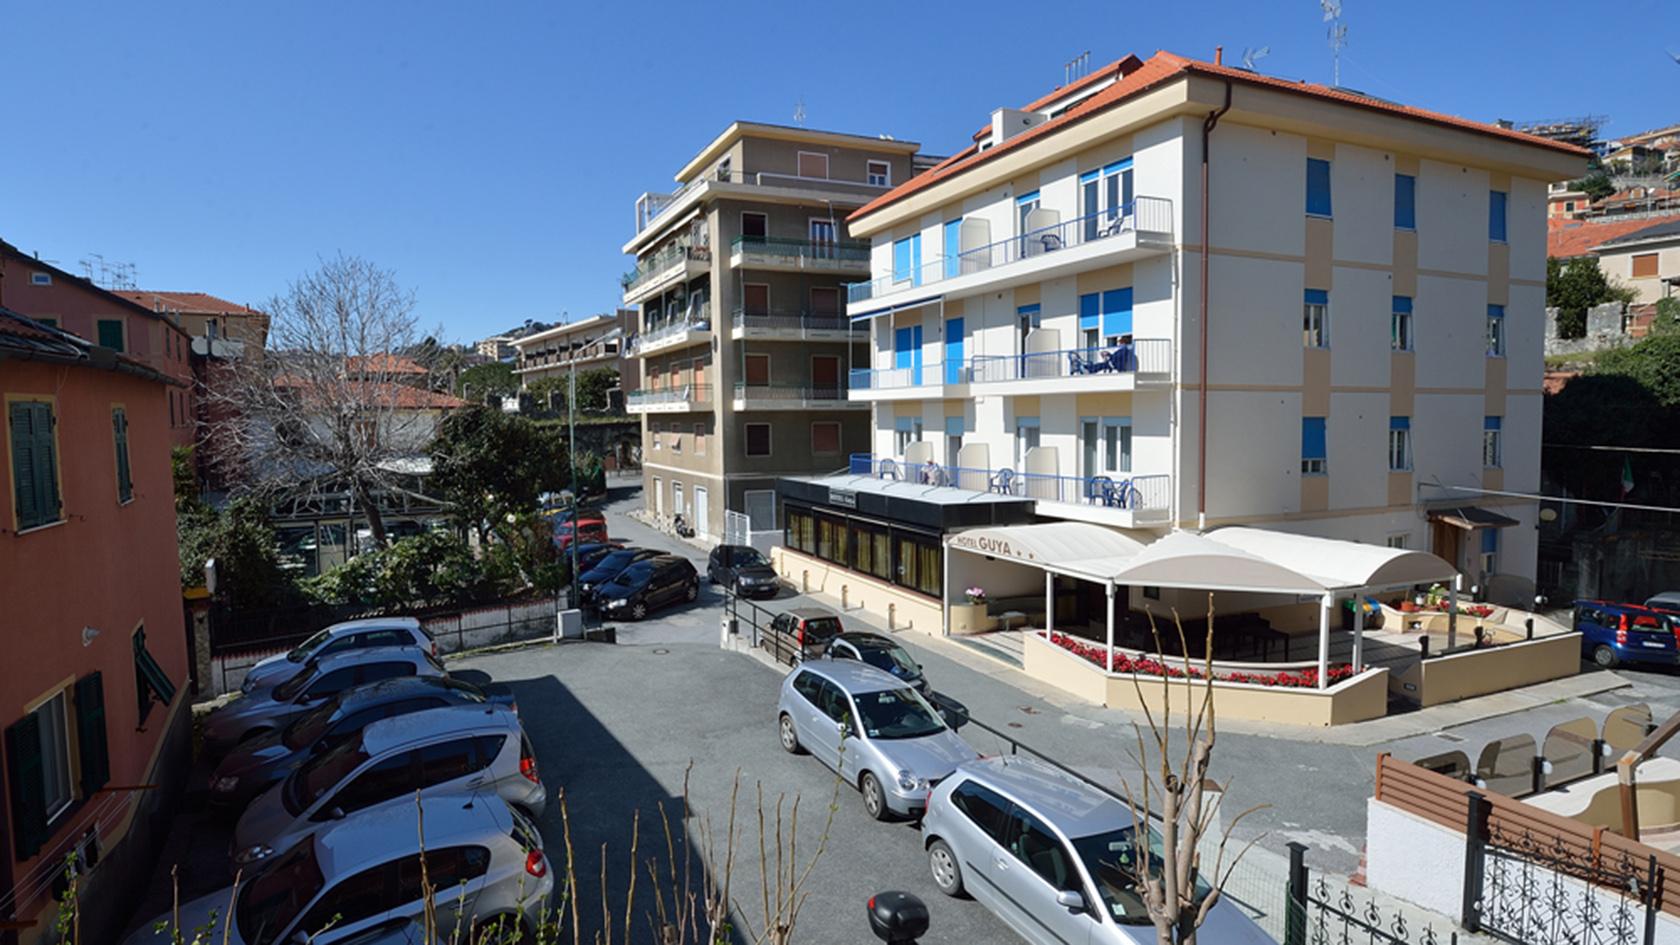 Hotel Guya